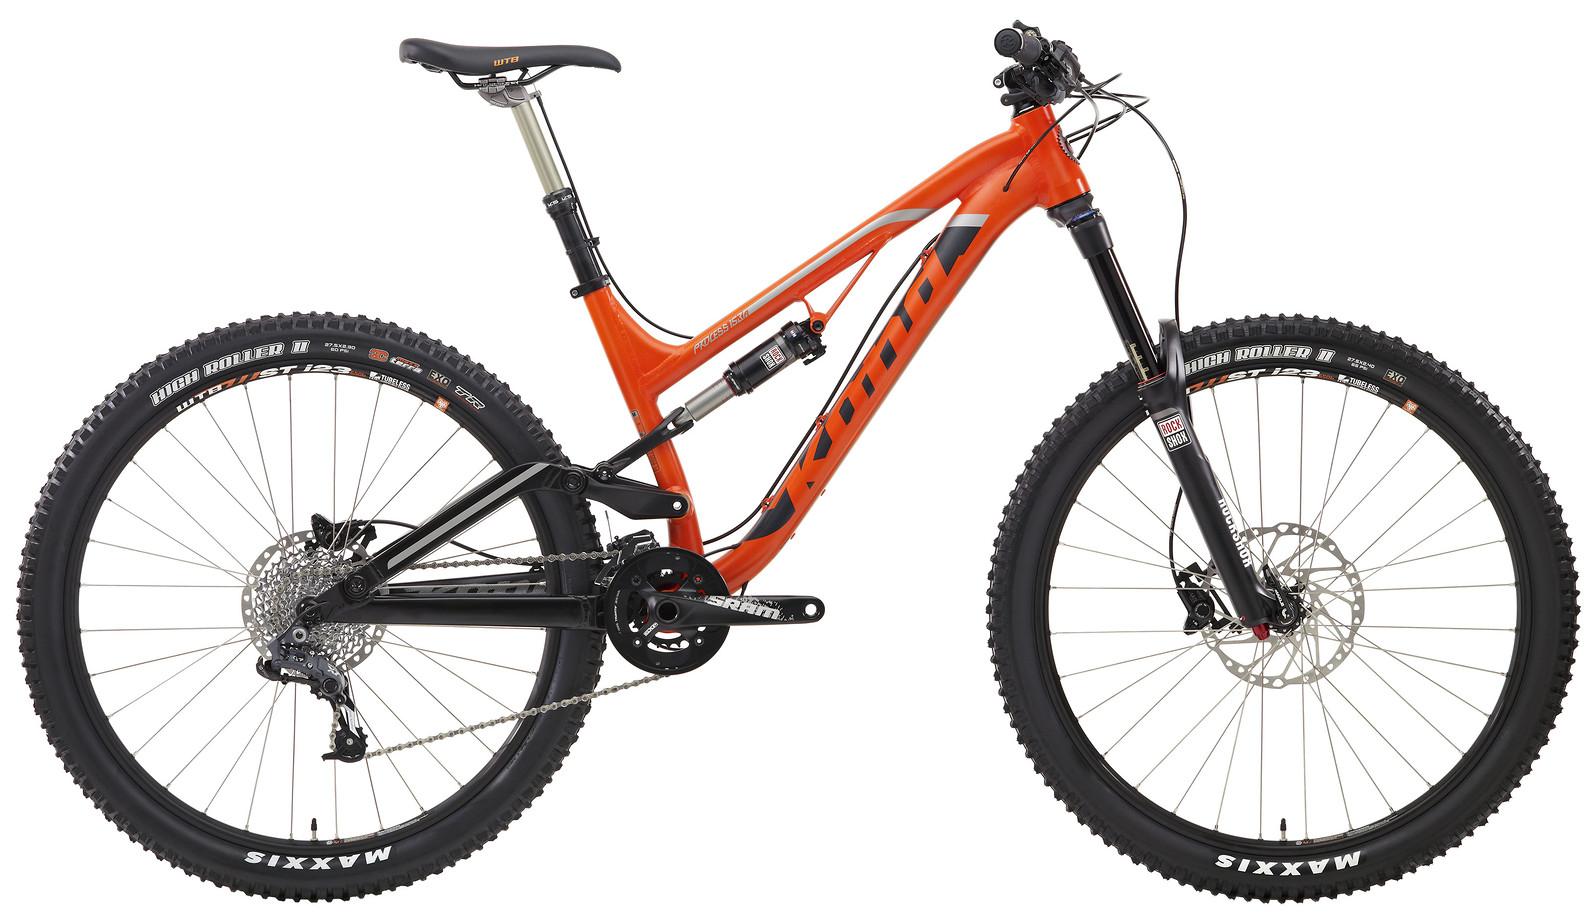 2014 Kona Process 153  Bike Process 153